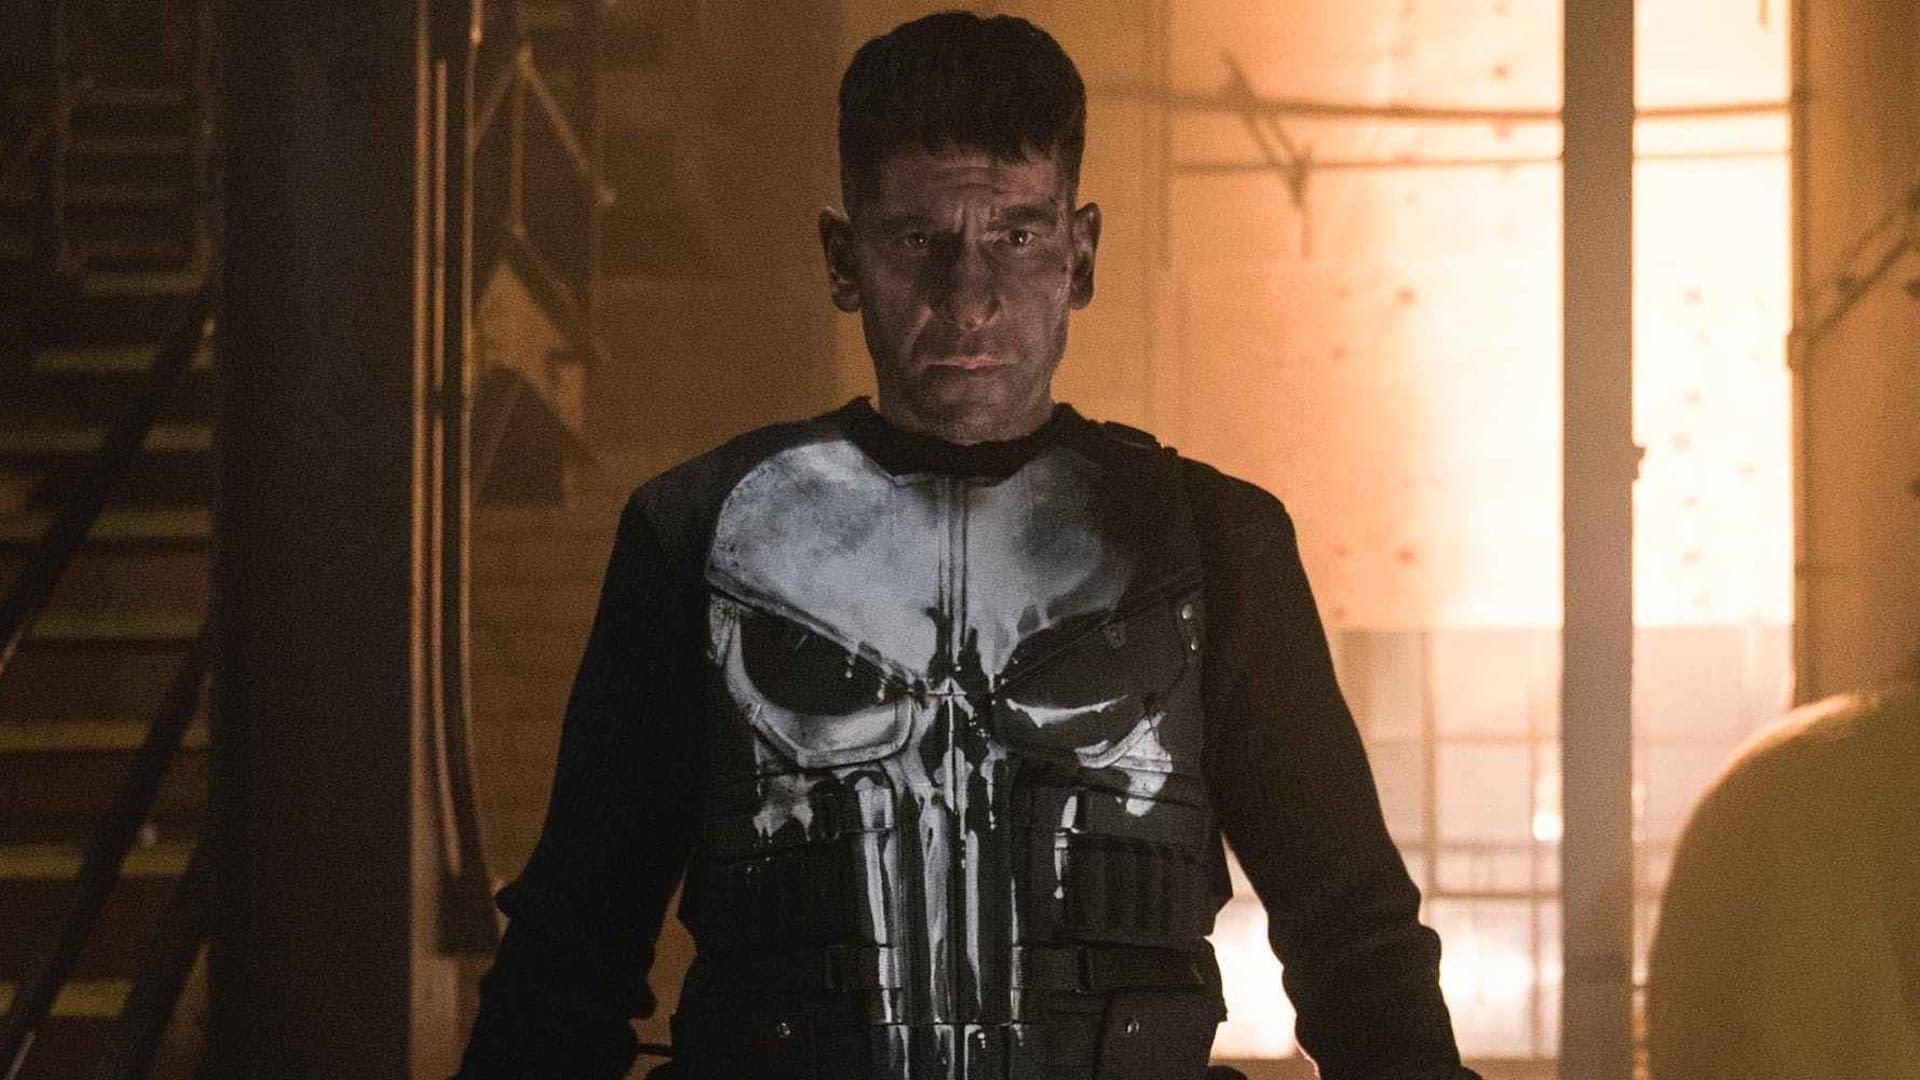 The Punisher and Jessica Jones Canceled by Netflix, Jessica Jones Season 3 Will Still Air